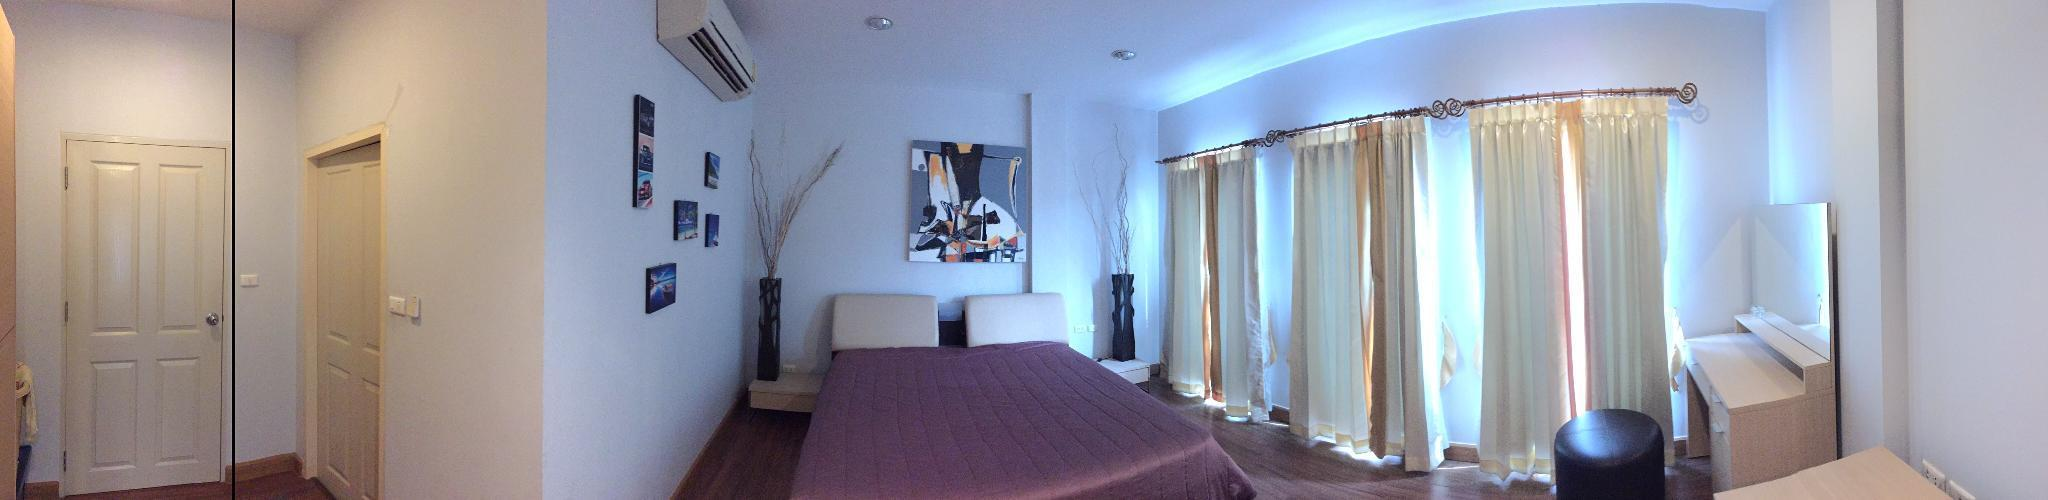 YADA SWEET HOME บ้านเดี่ยว 3 ห้องนอน 3 ห้องน้ำส่วนตัว ขนาด 173 ตร.ม. – บางนา